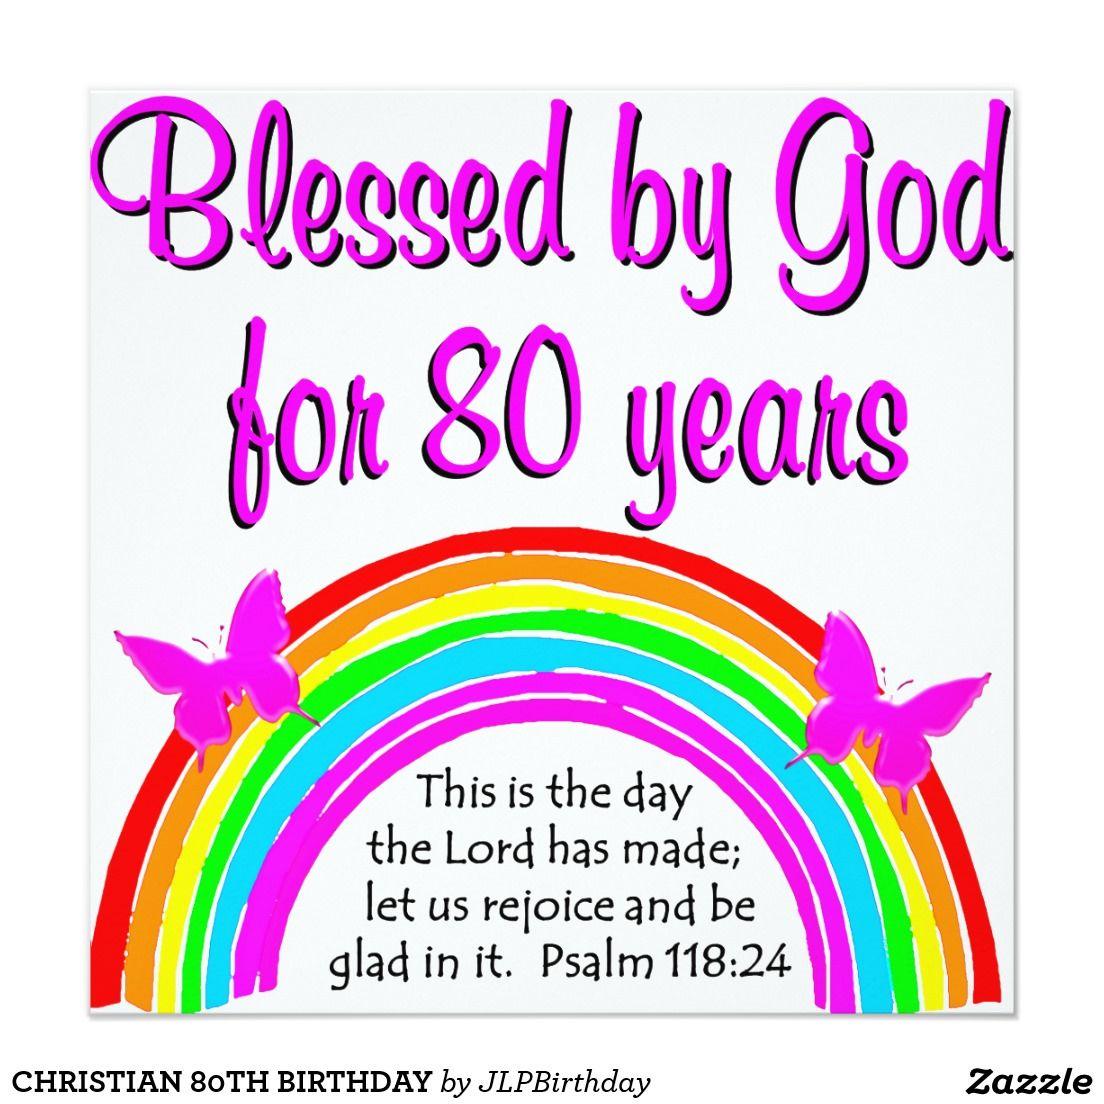 Christian 80th birthday card birthday